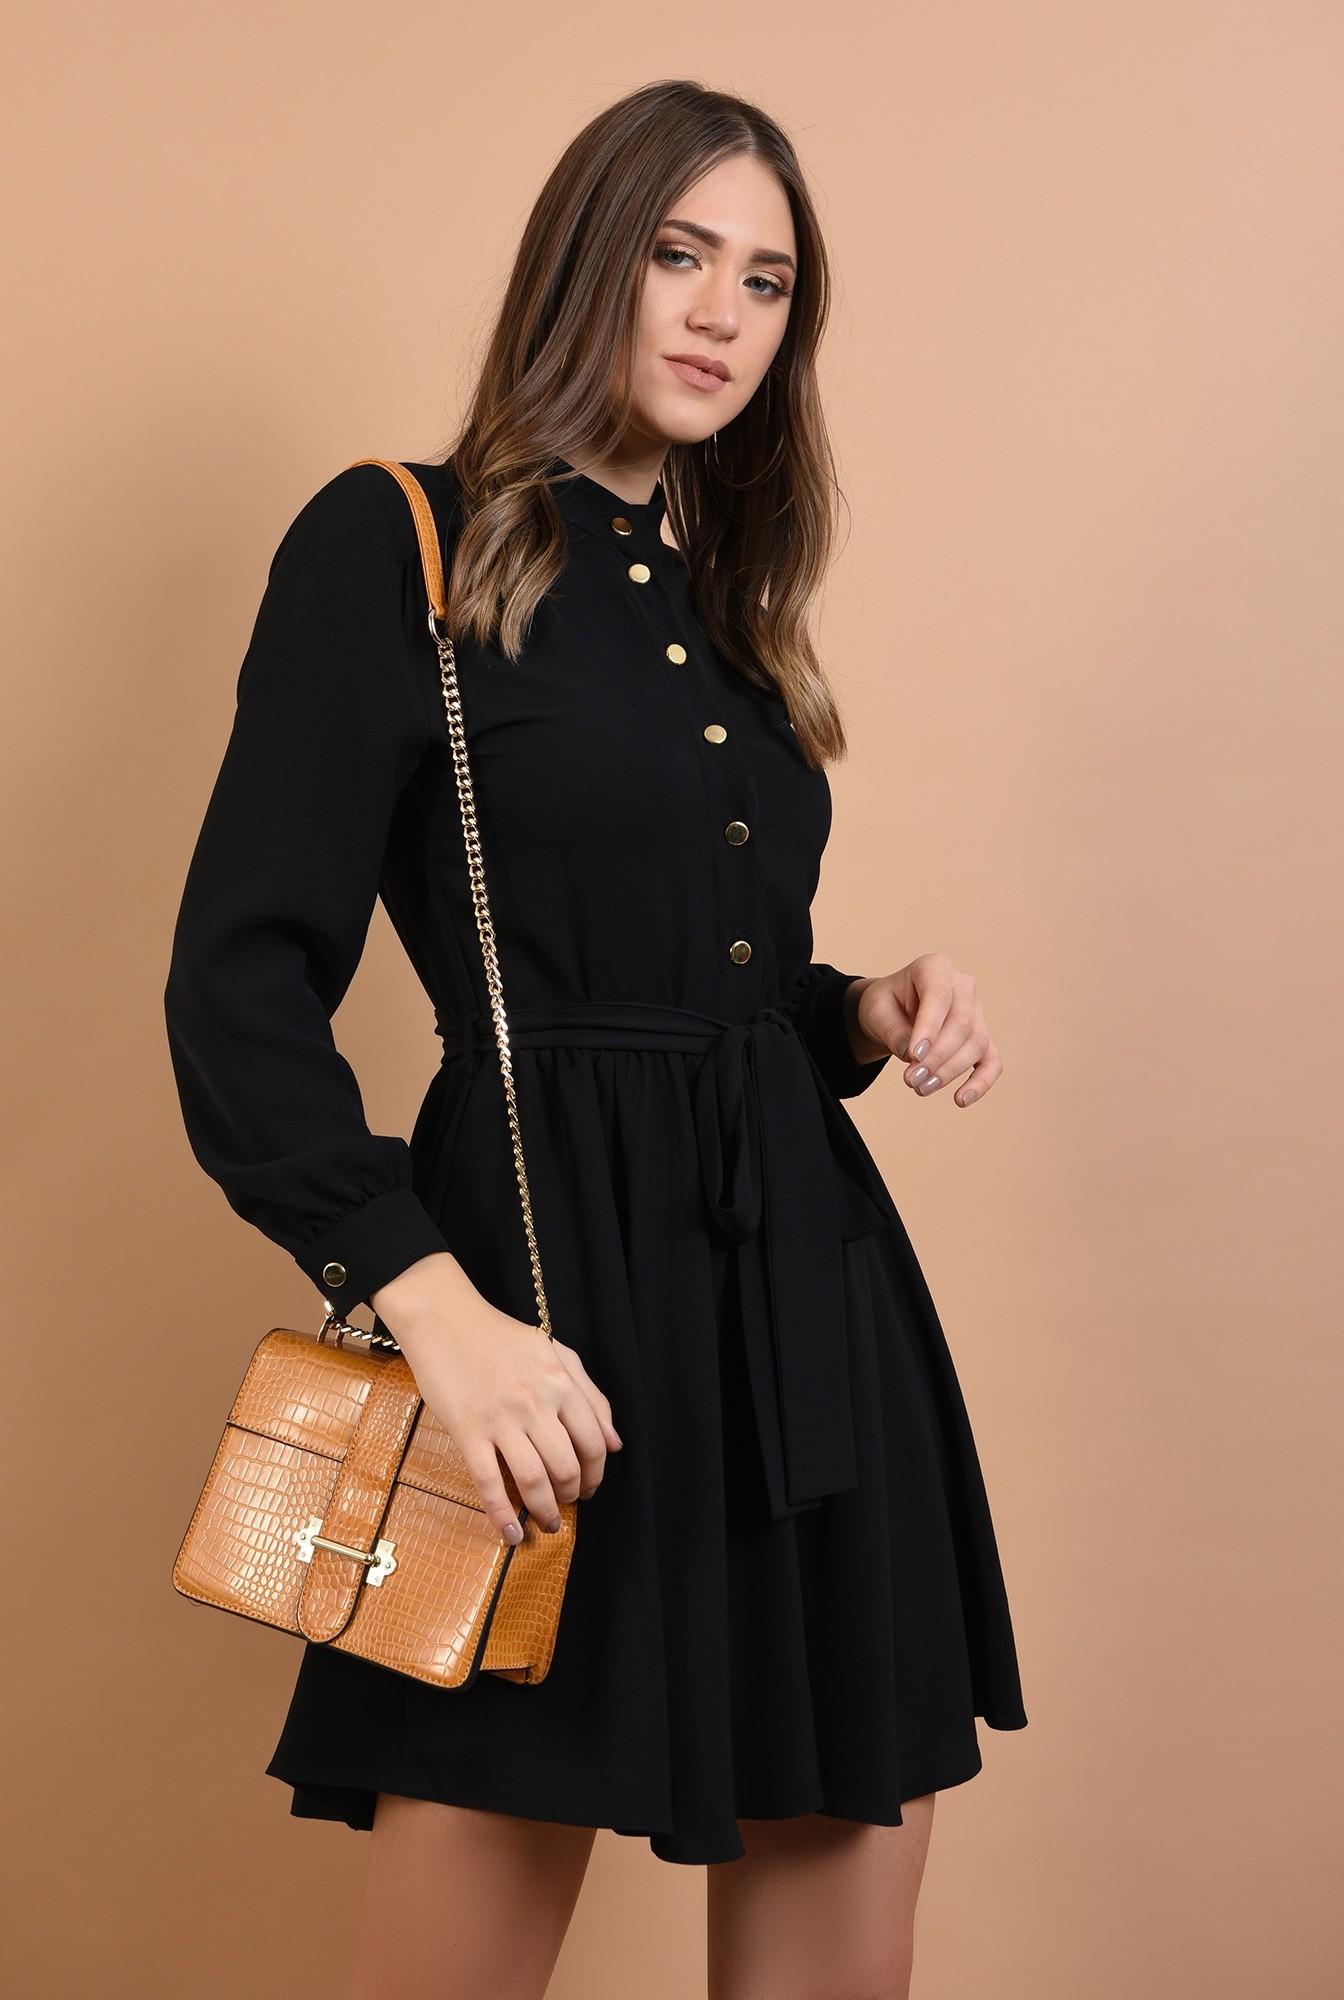 0 - rochie neagra, scurta, cu nasturi, cordon, Poema